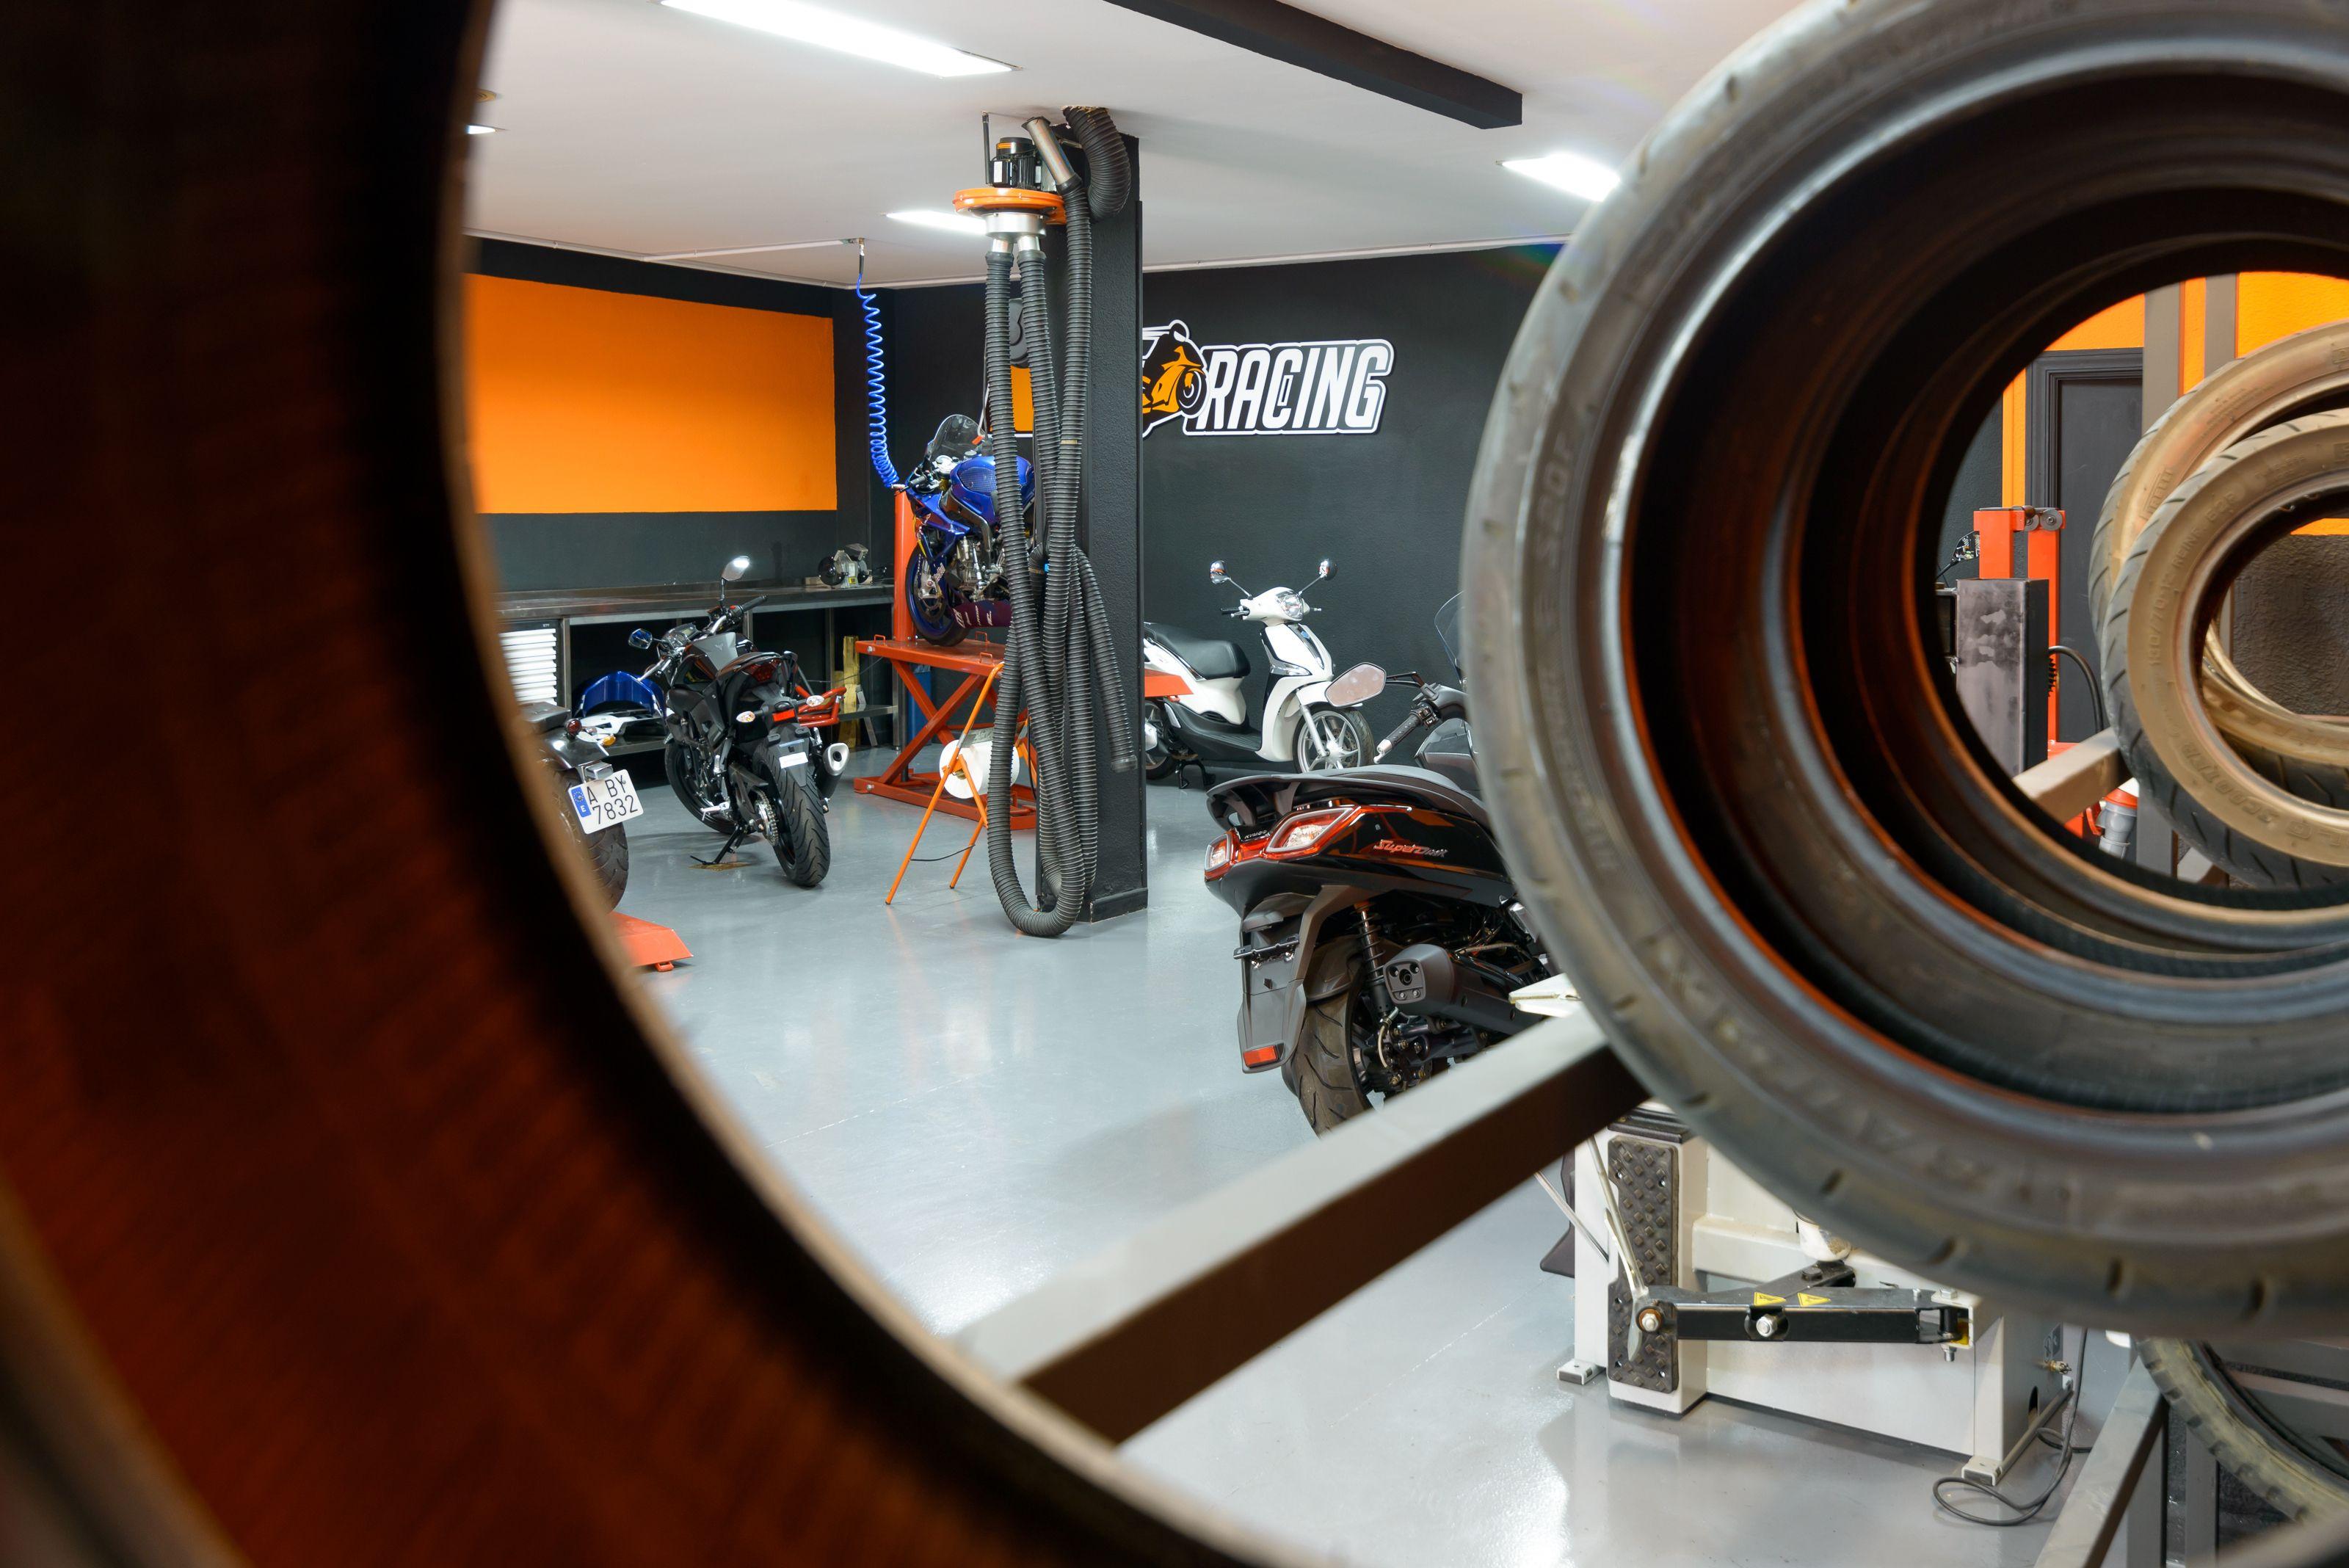 Reparación de motos en Alcobendas